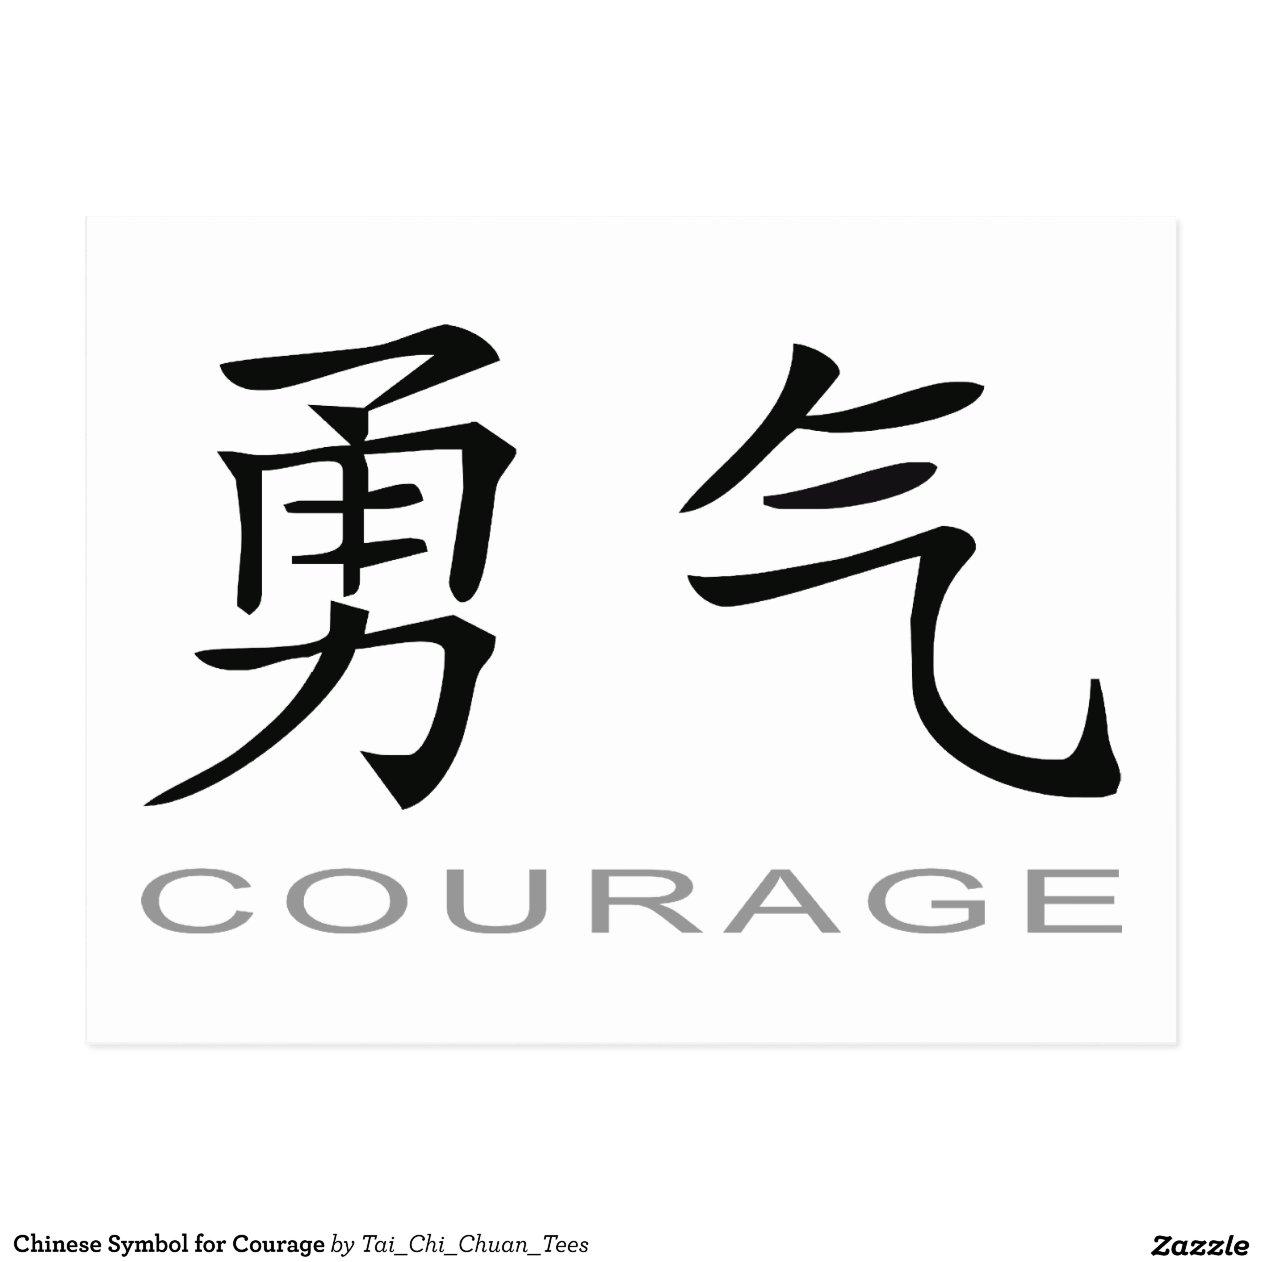 chinesisches symbol fur mut postkarte rf05756499be7465d8fcf52f73b013653 vgbaq 8byvr. Black Bedroom Furniture Sets. Home Design Ideas